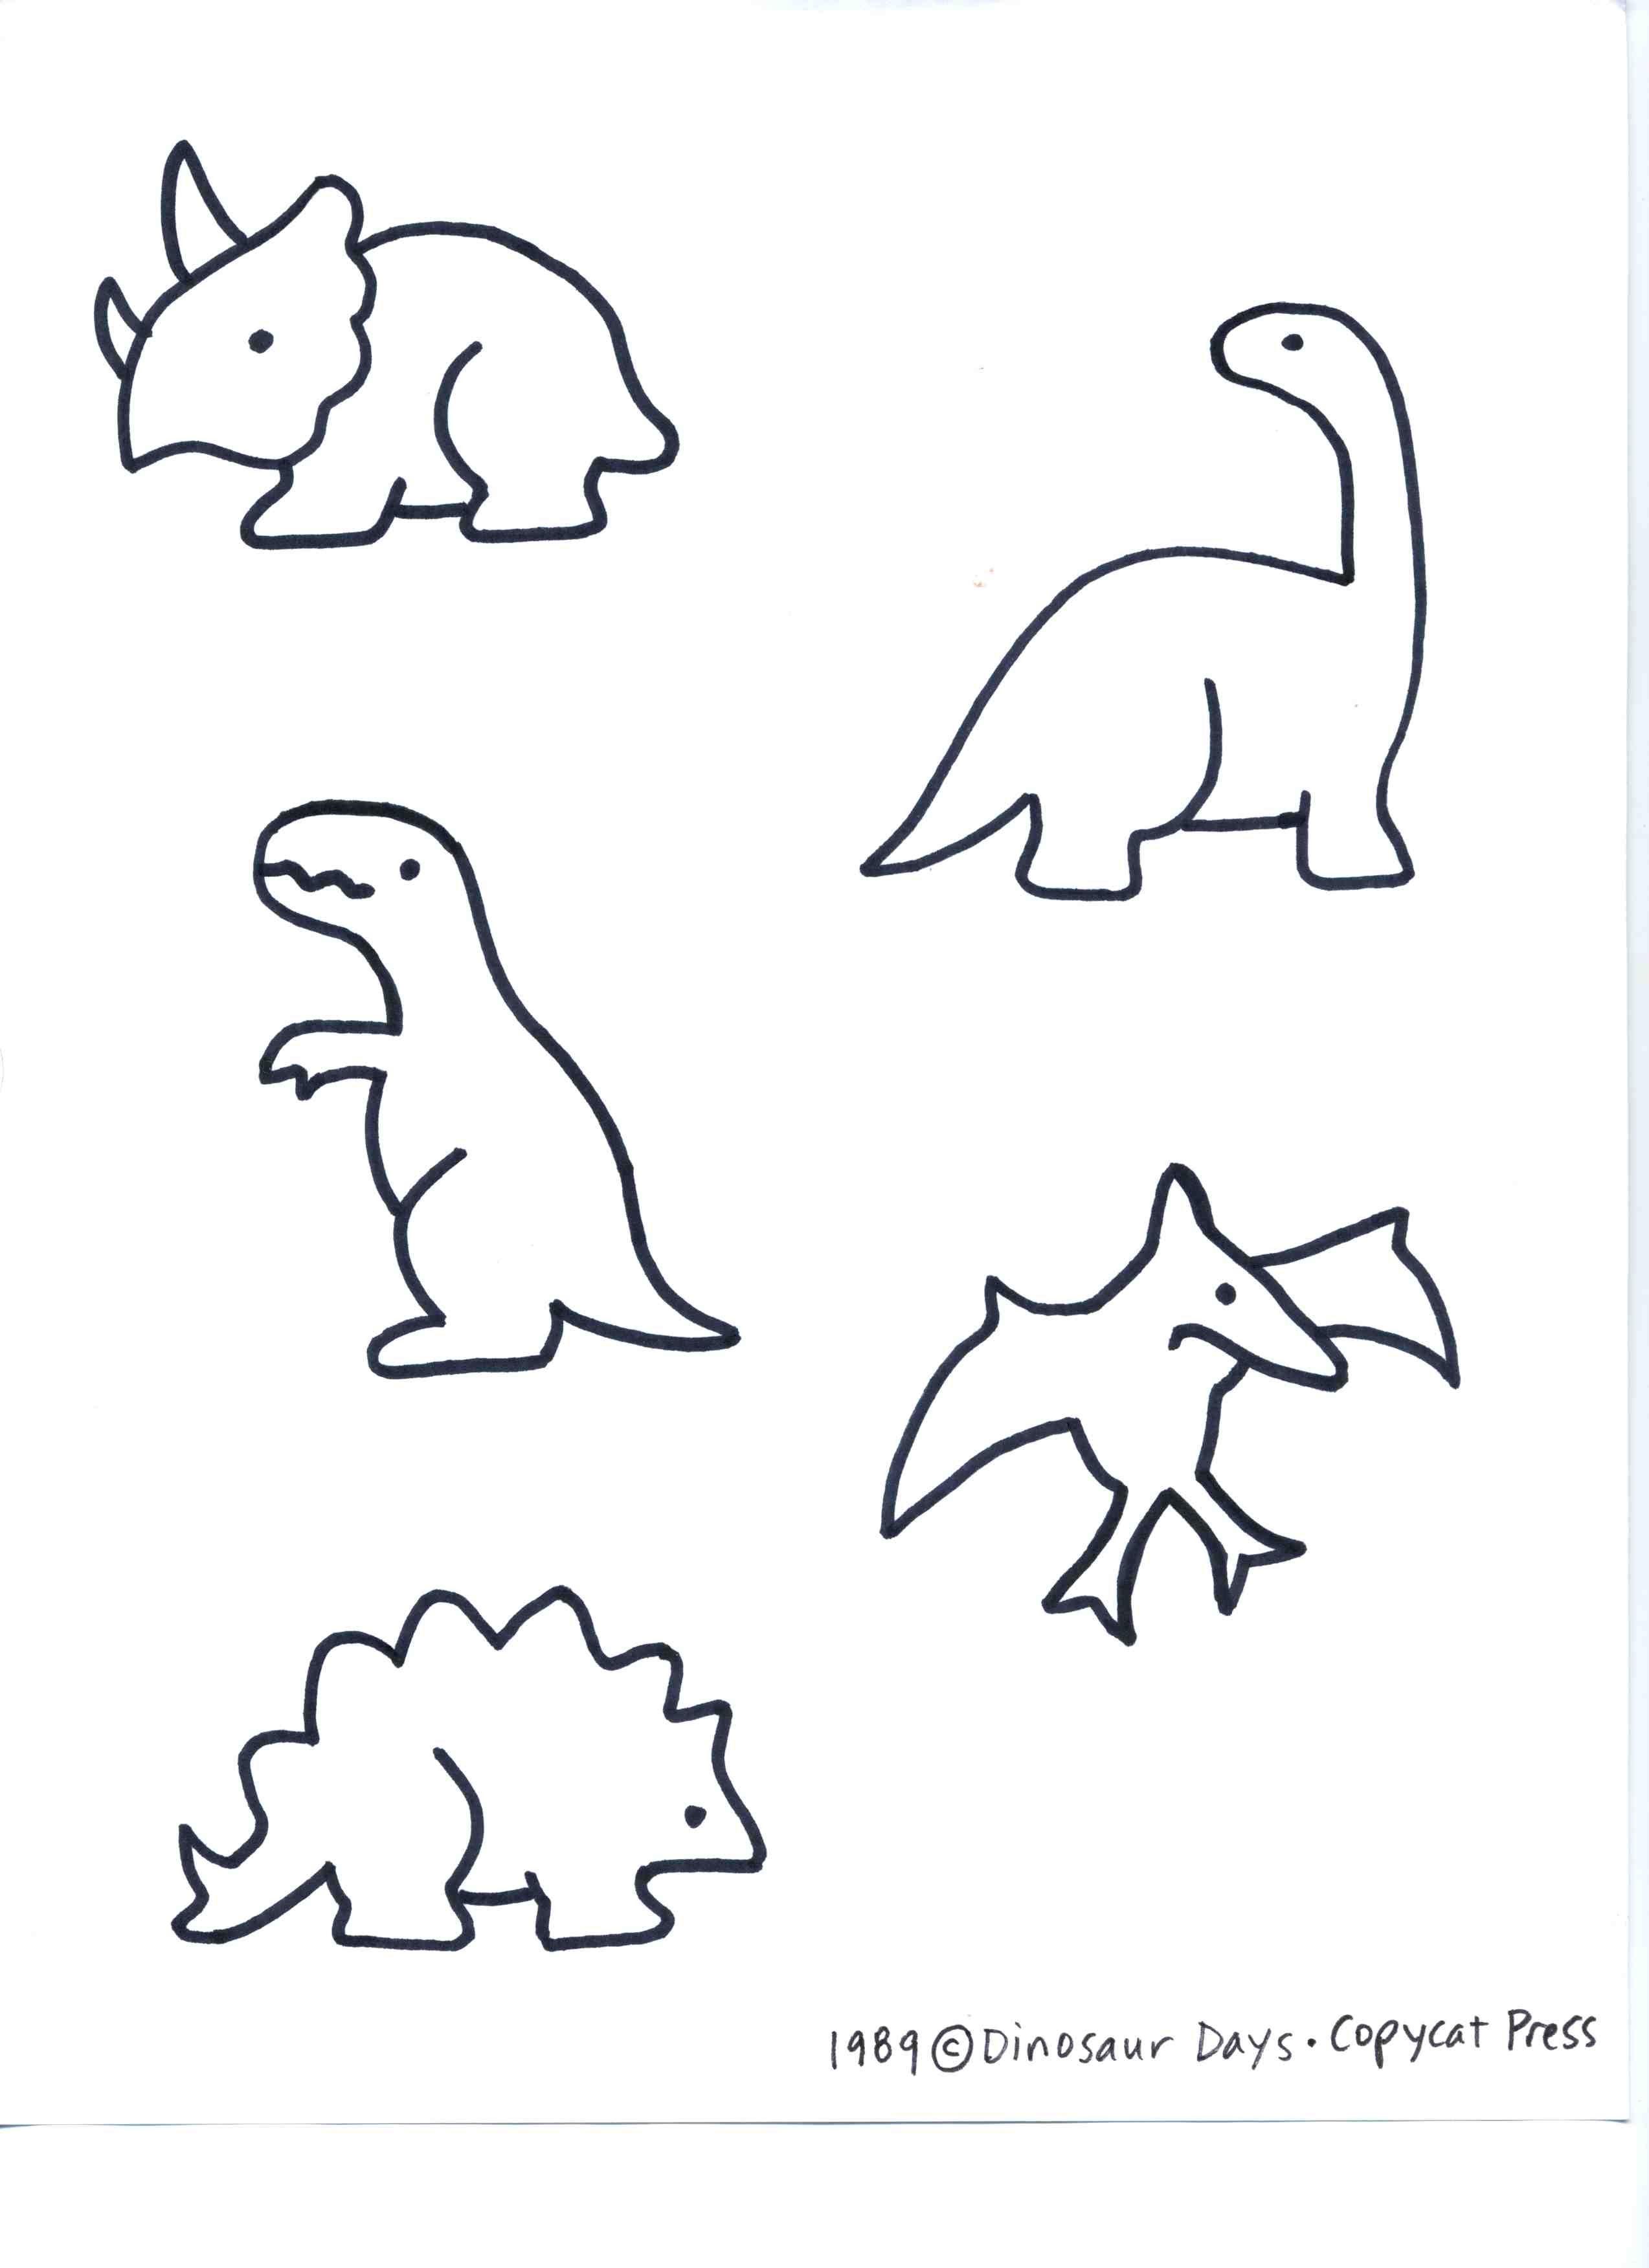 Dino shapes | tattoo | Pinterest | Tatuajes, Ideas de tatuajes y ...